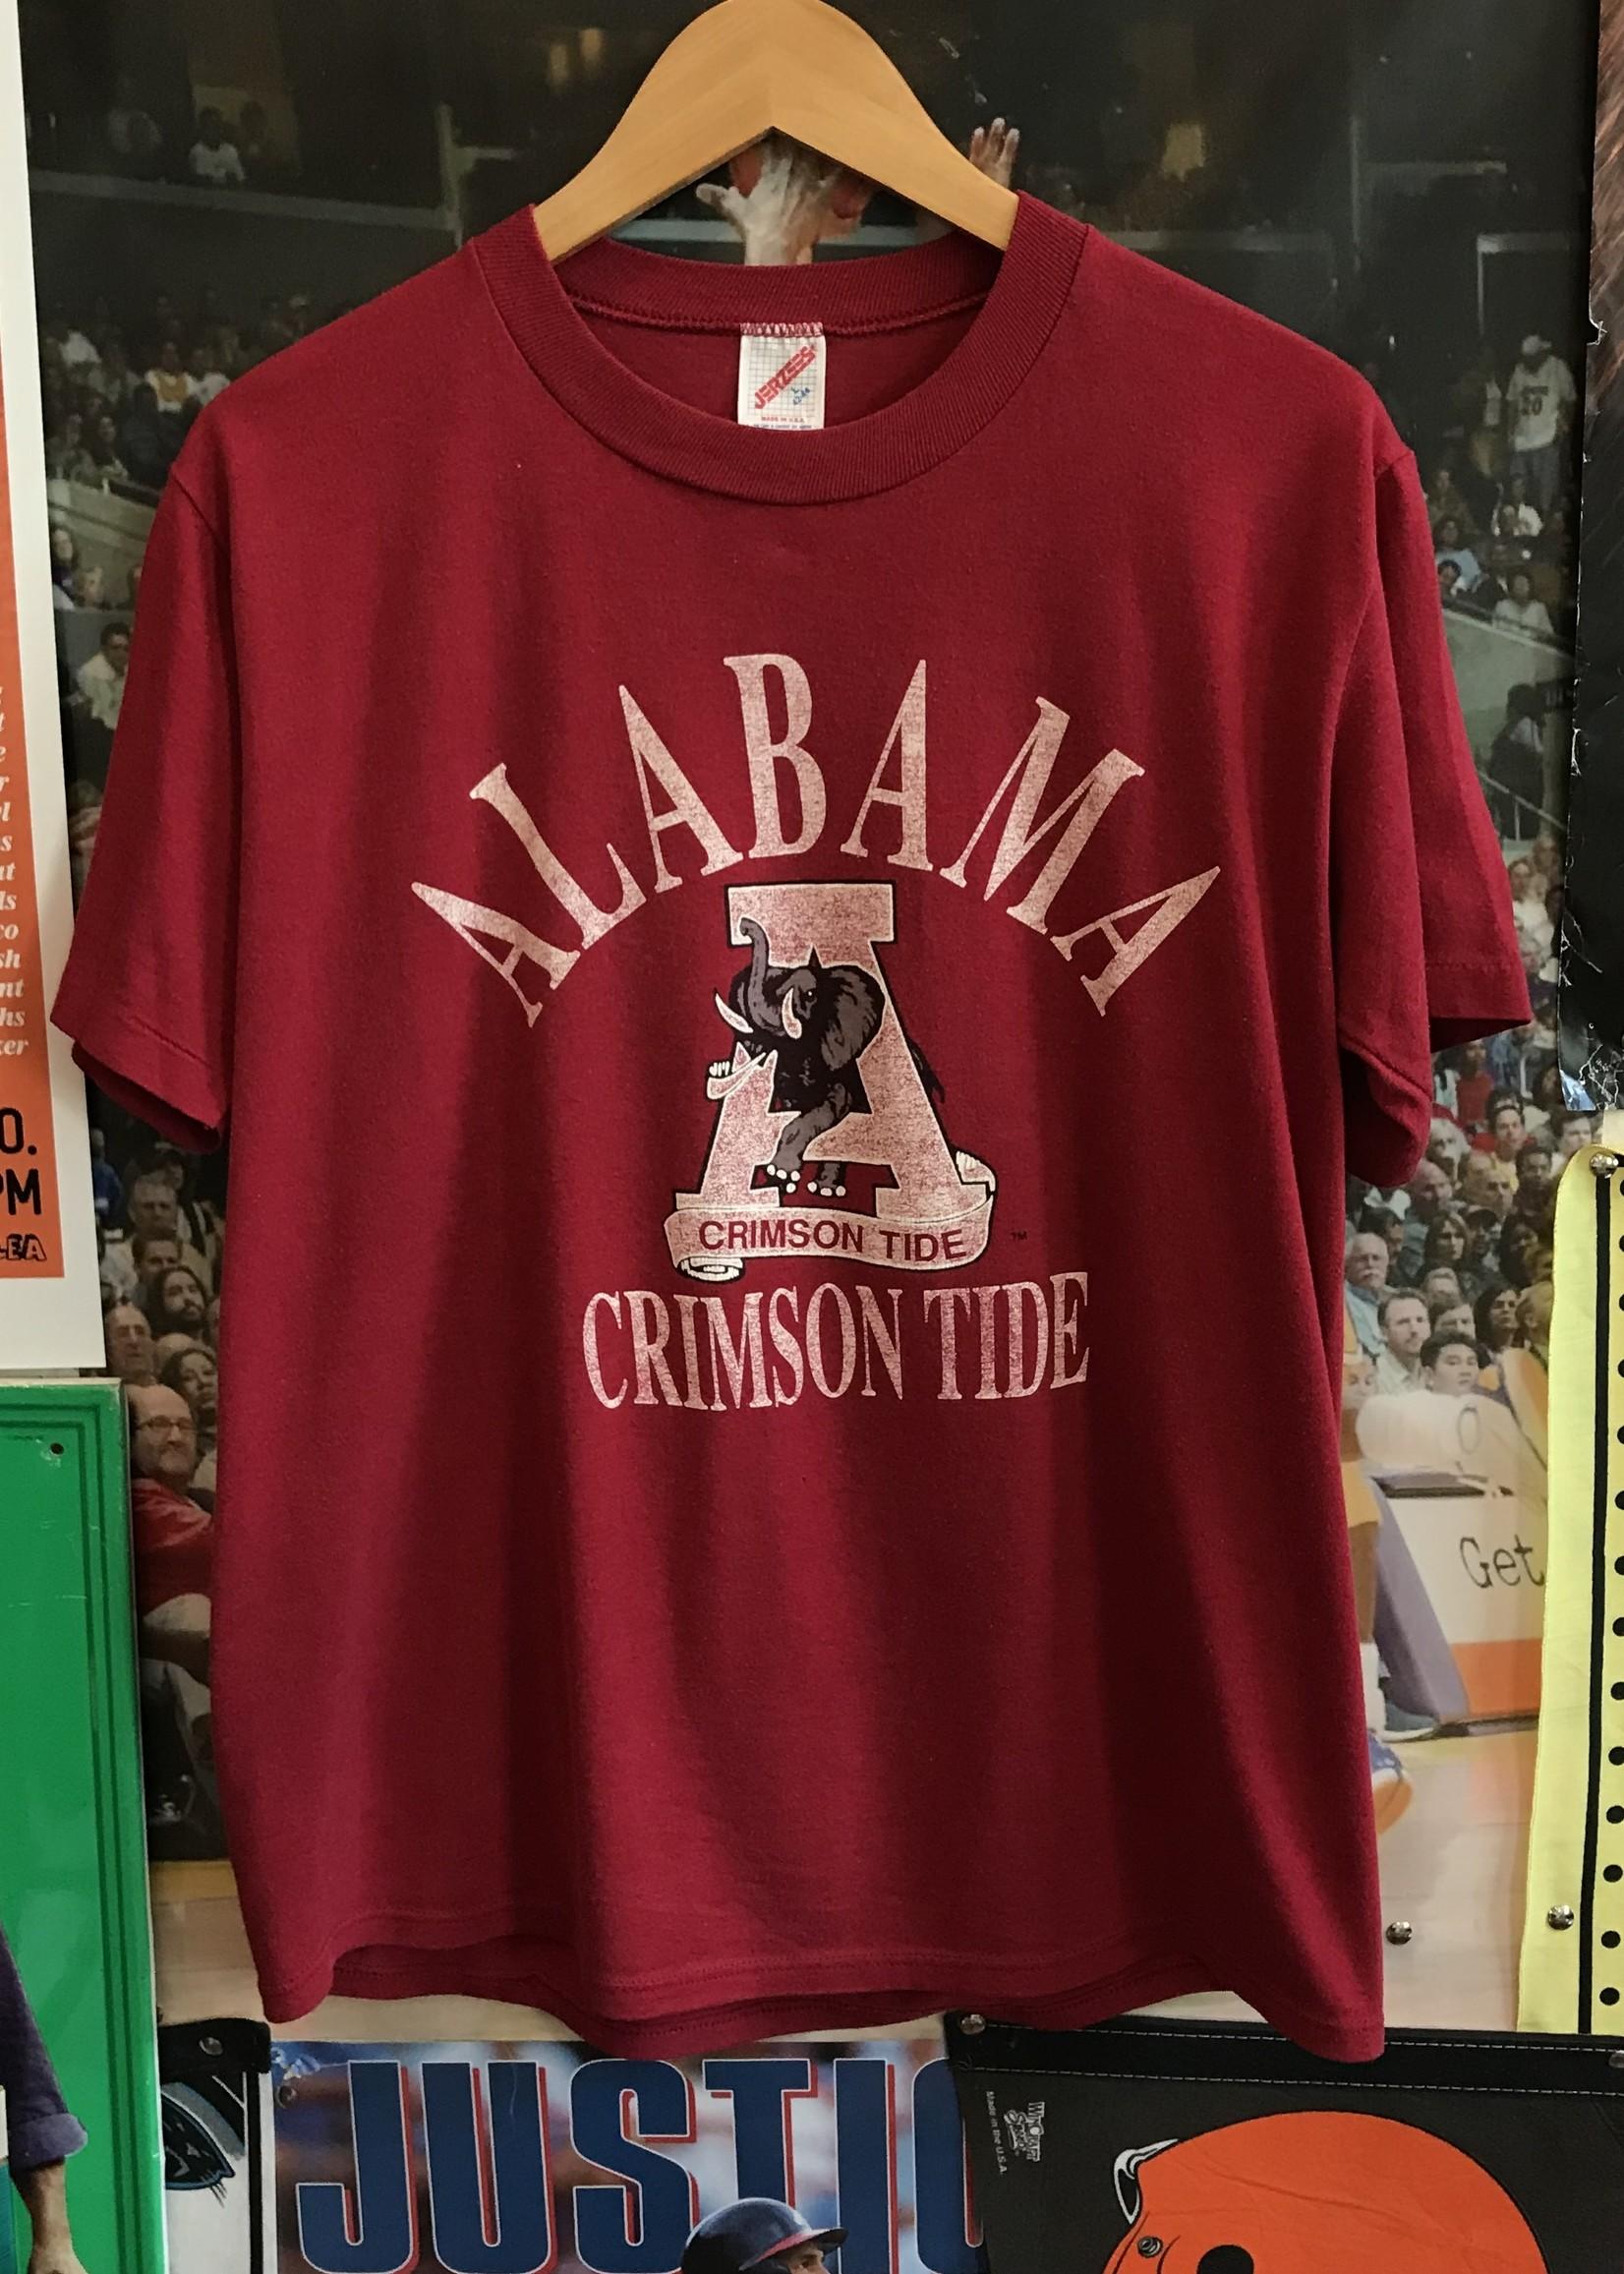 4827alabama crimson tide tee maroons sz L